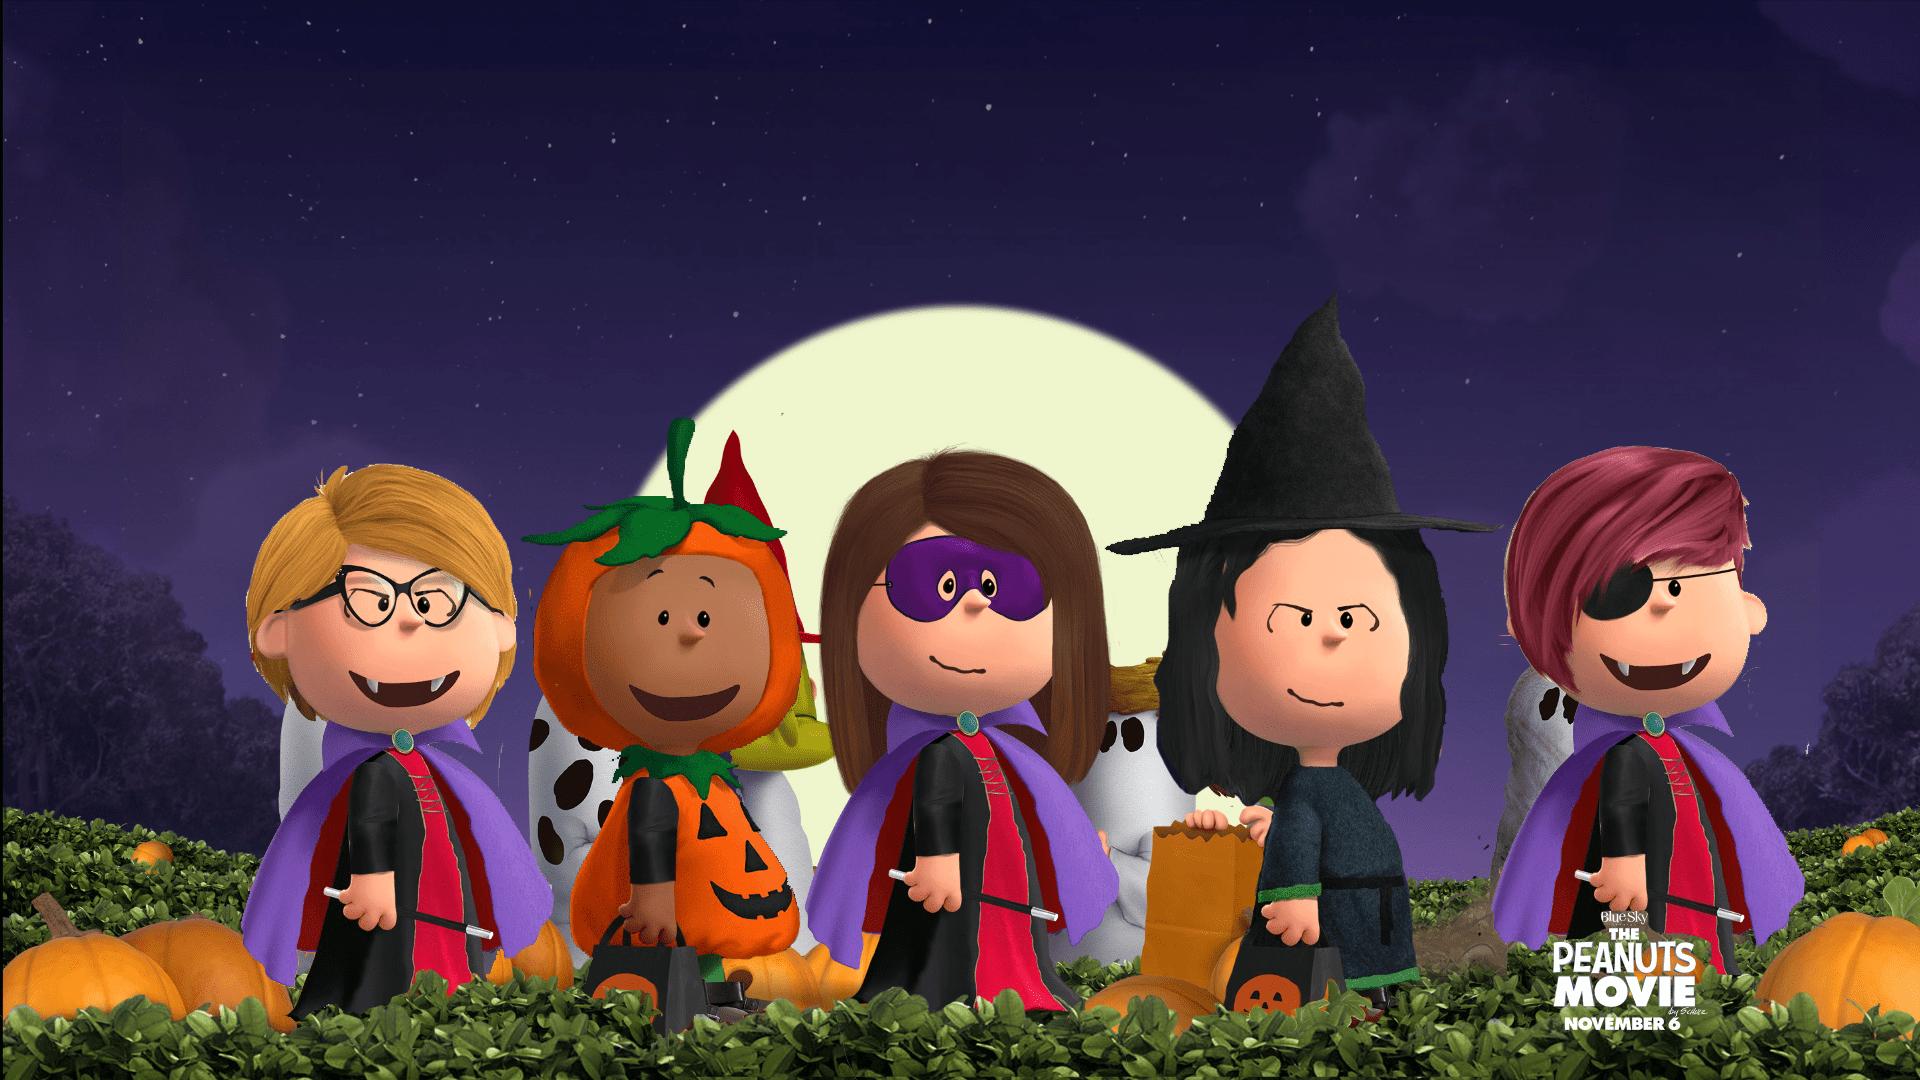 Peanuts Halloween Wallpapers Top Free Peanuts Halloween Backgrounds Wallpaperaccess